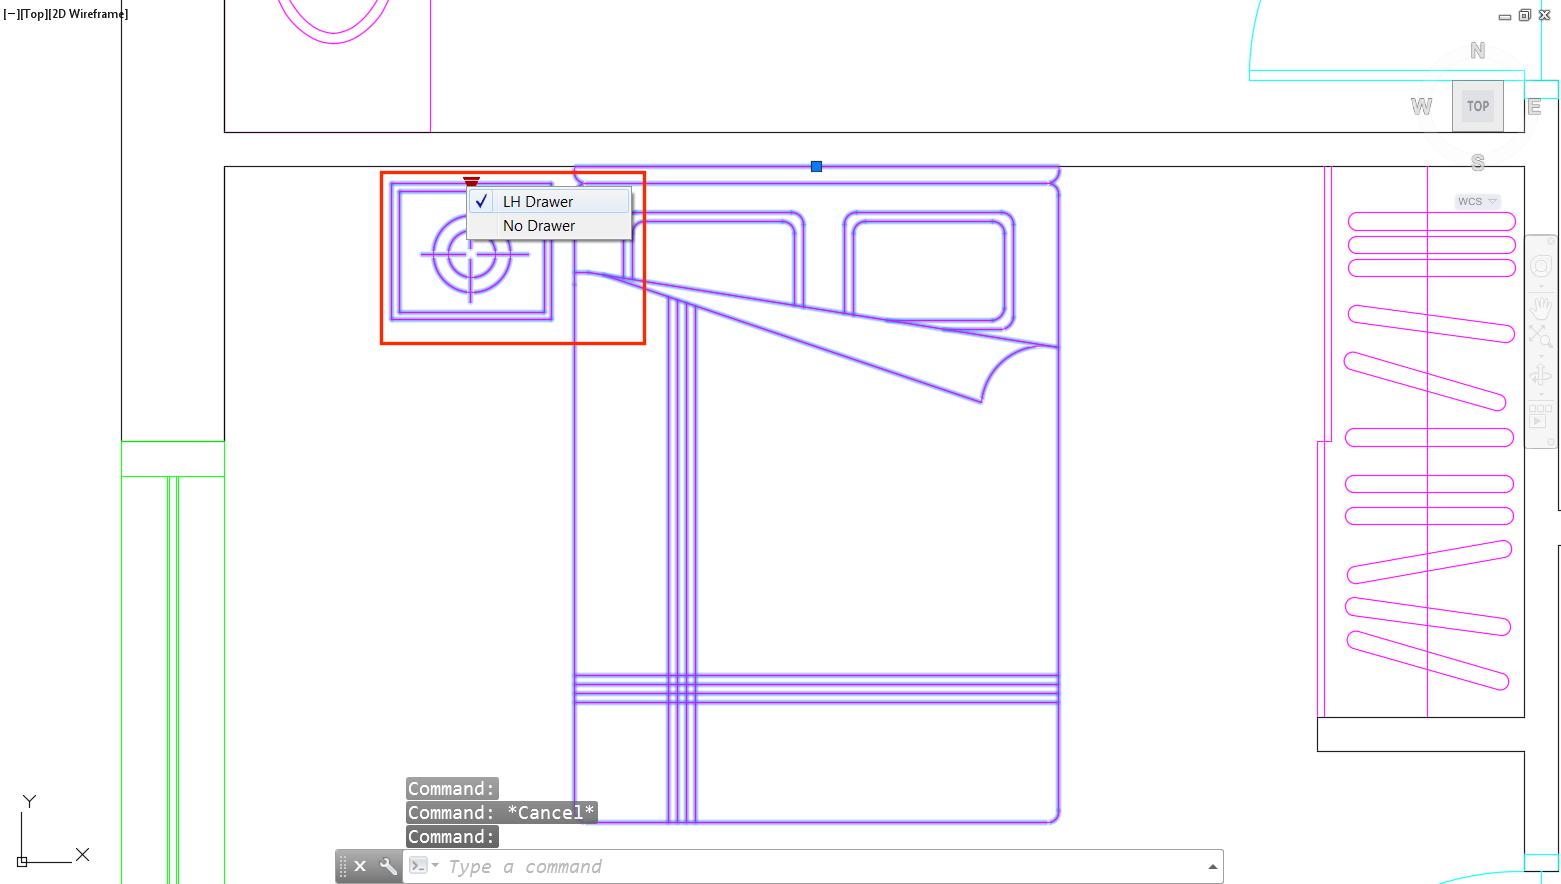 AutoCAD Training Article - Ch 4 - Screenshot 16